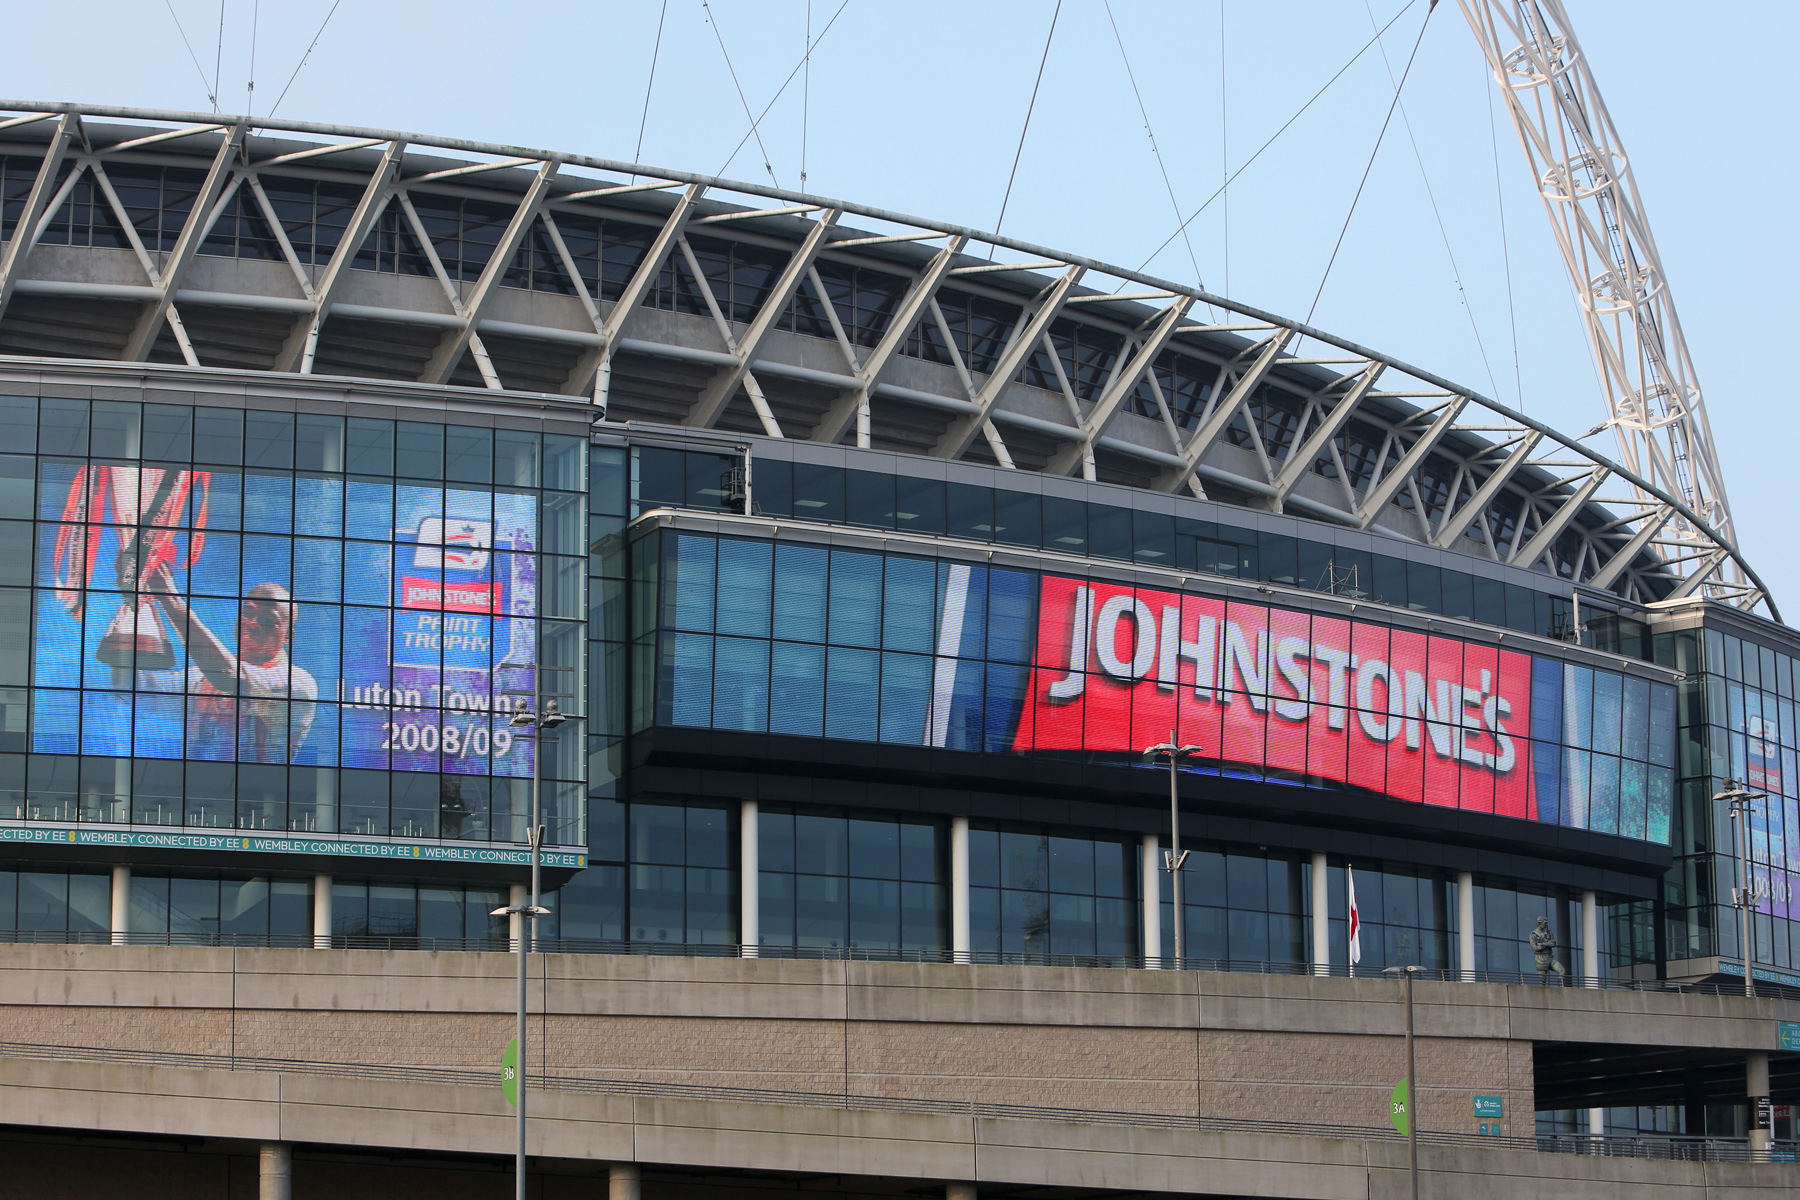 PR_Wembley1.jpg